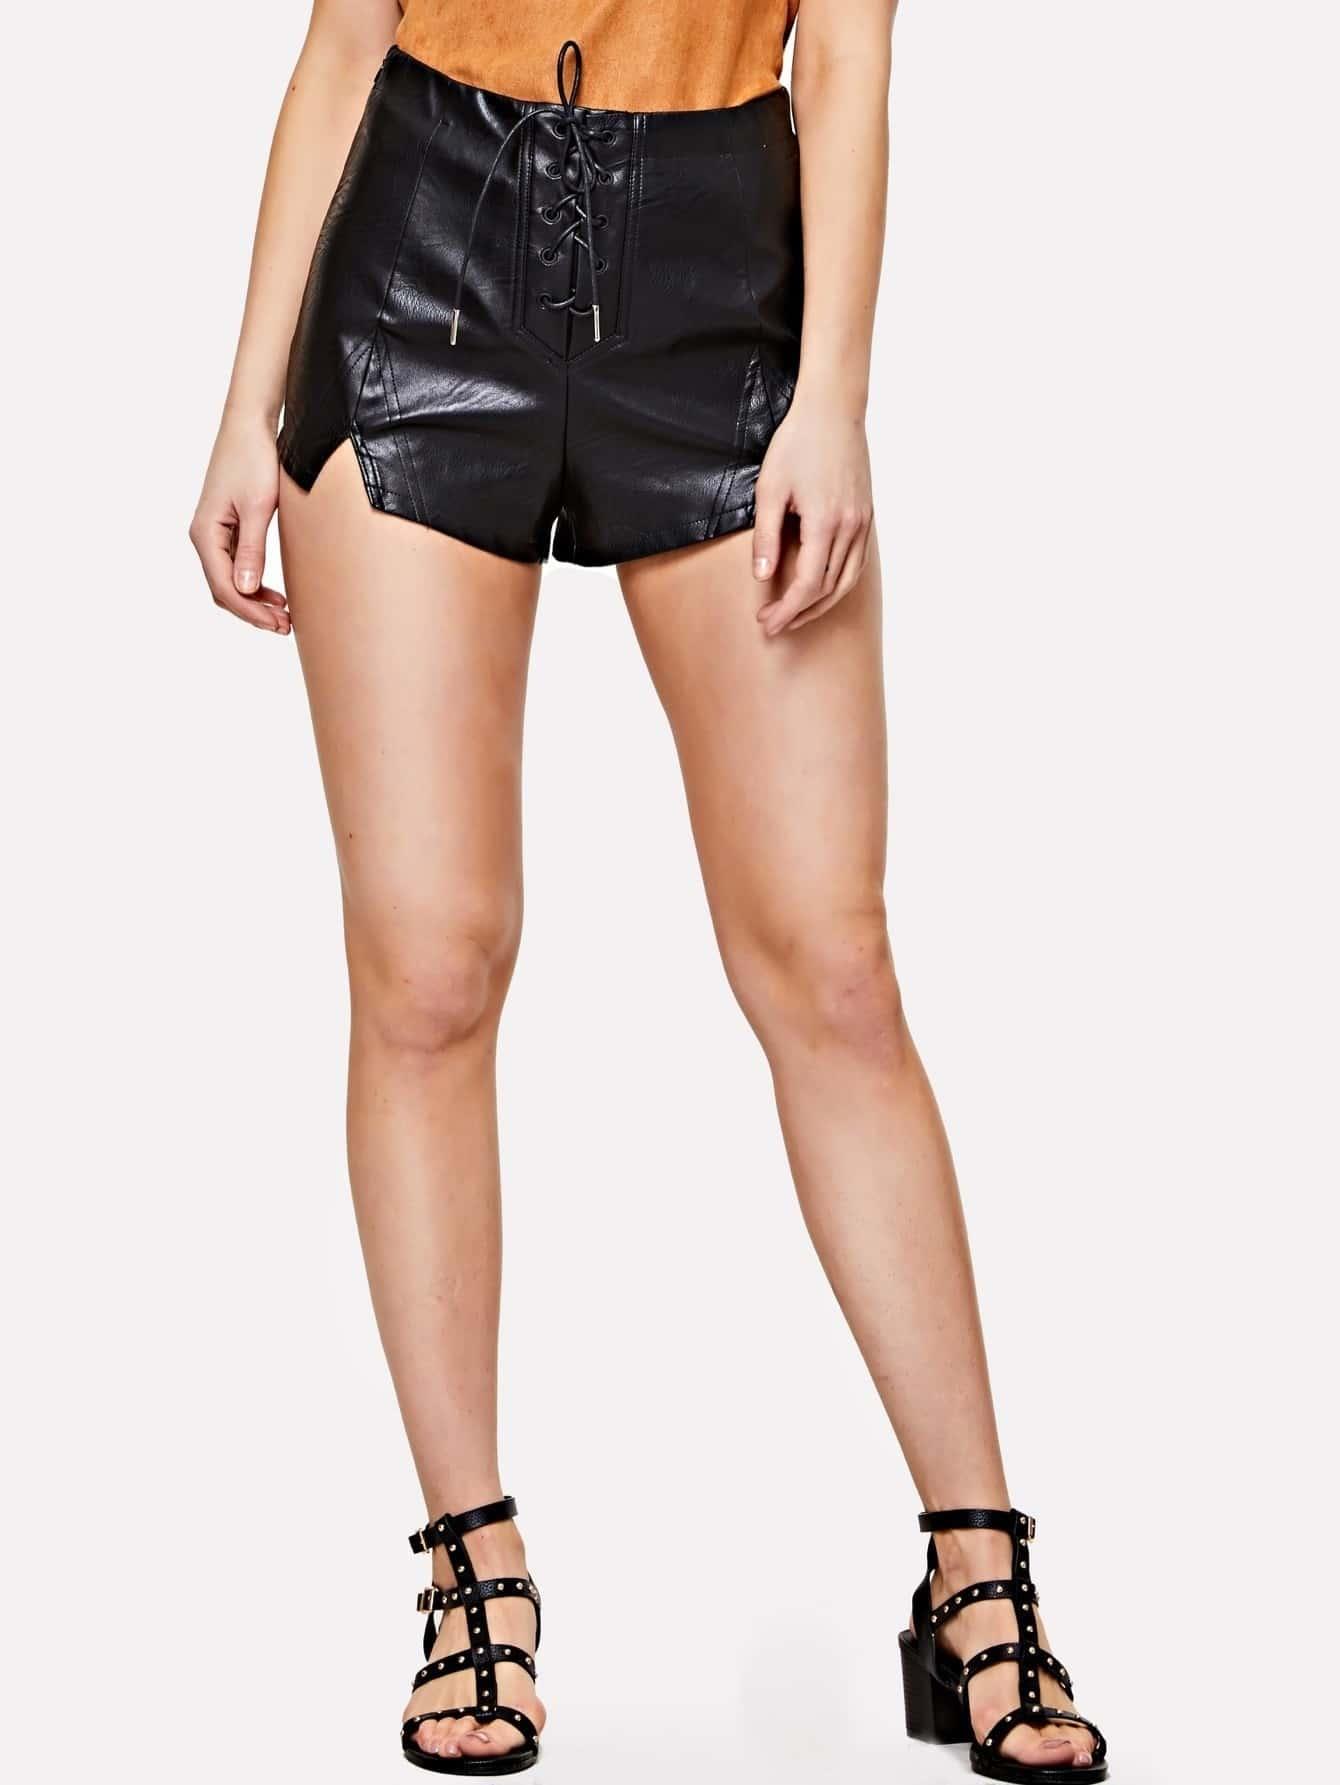 Lace Up Front Slit Hem PU Leather Shorts christine darvin new ego men